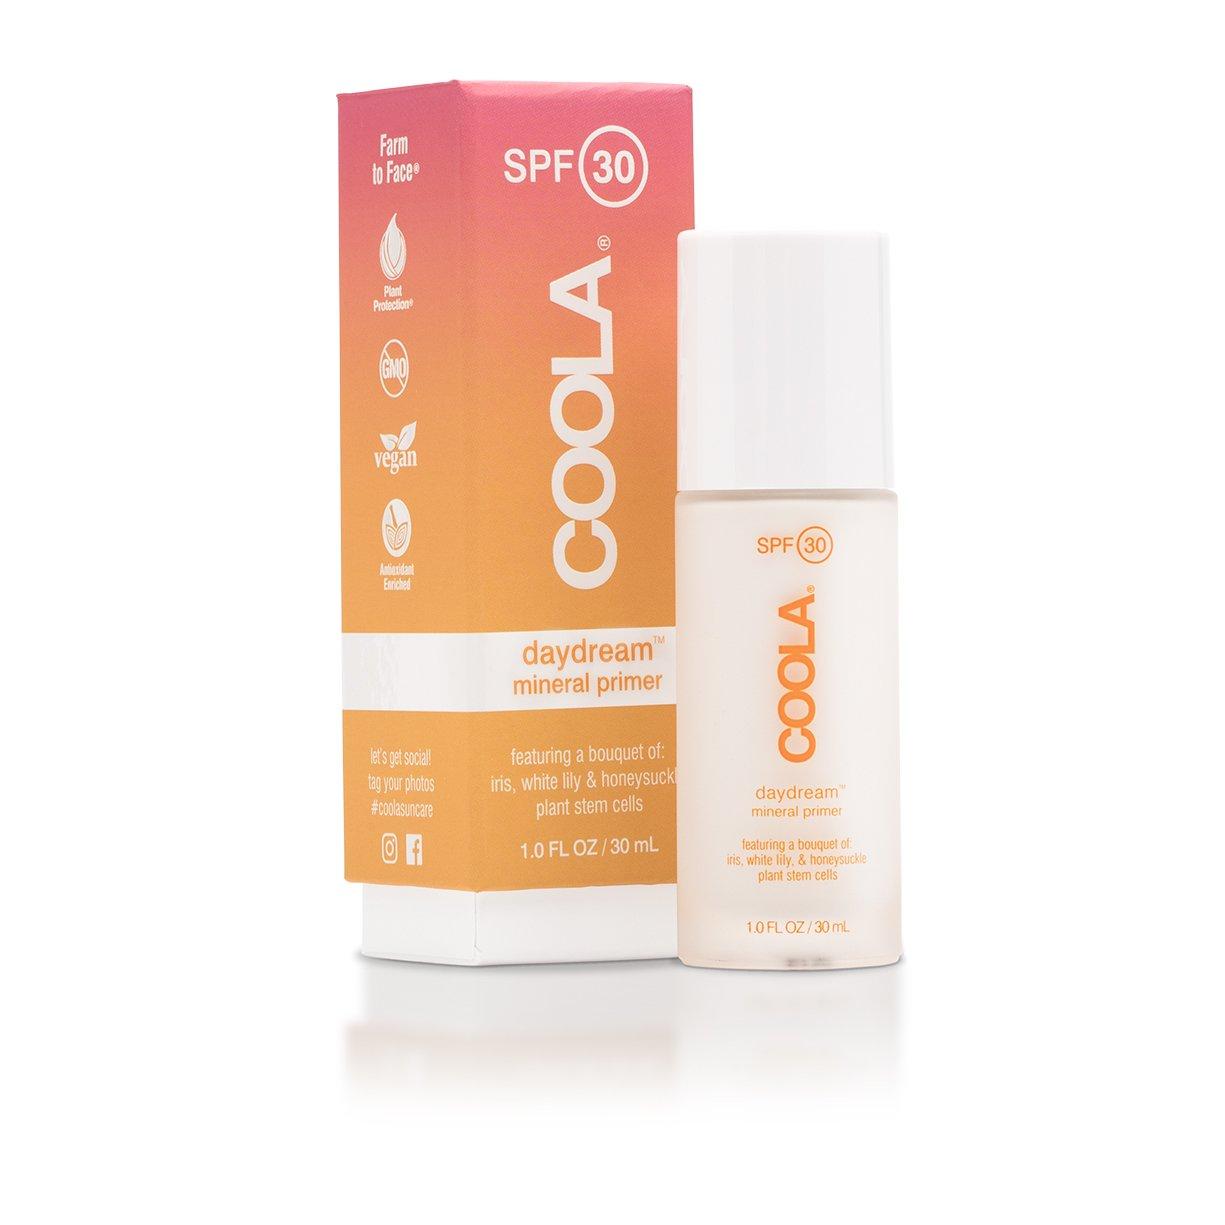 Daydream Mineral Makeup Primer Sunscreen SPF 30 COOLA